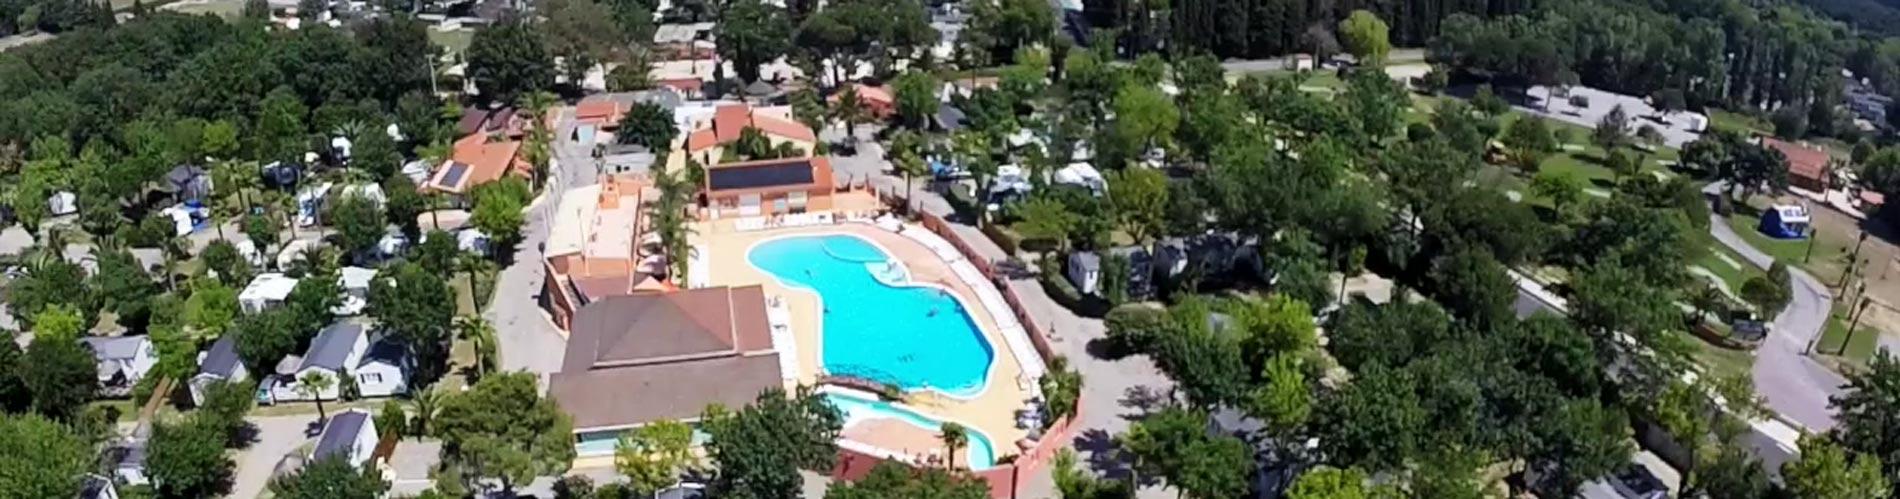 Camping argeles sur mer avec parc aquatique for Camping queyras avec piscine